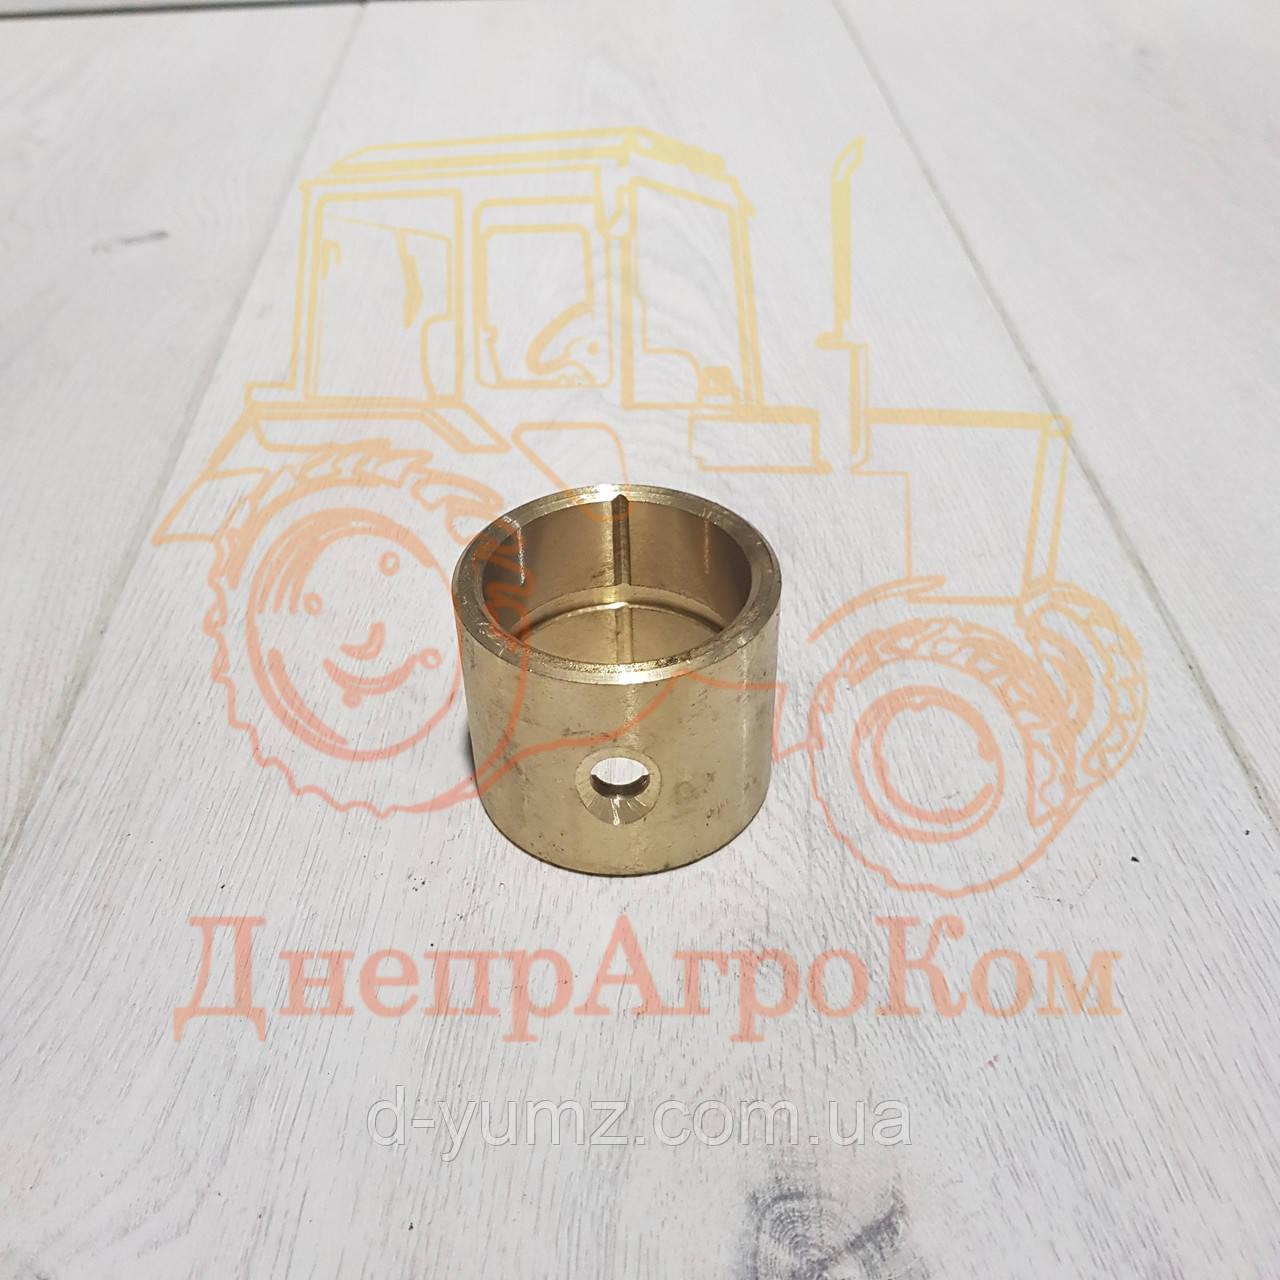 Втулка распредвала передняя ЮМЗ Д-65| бронзовая | Д01-008